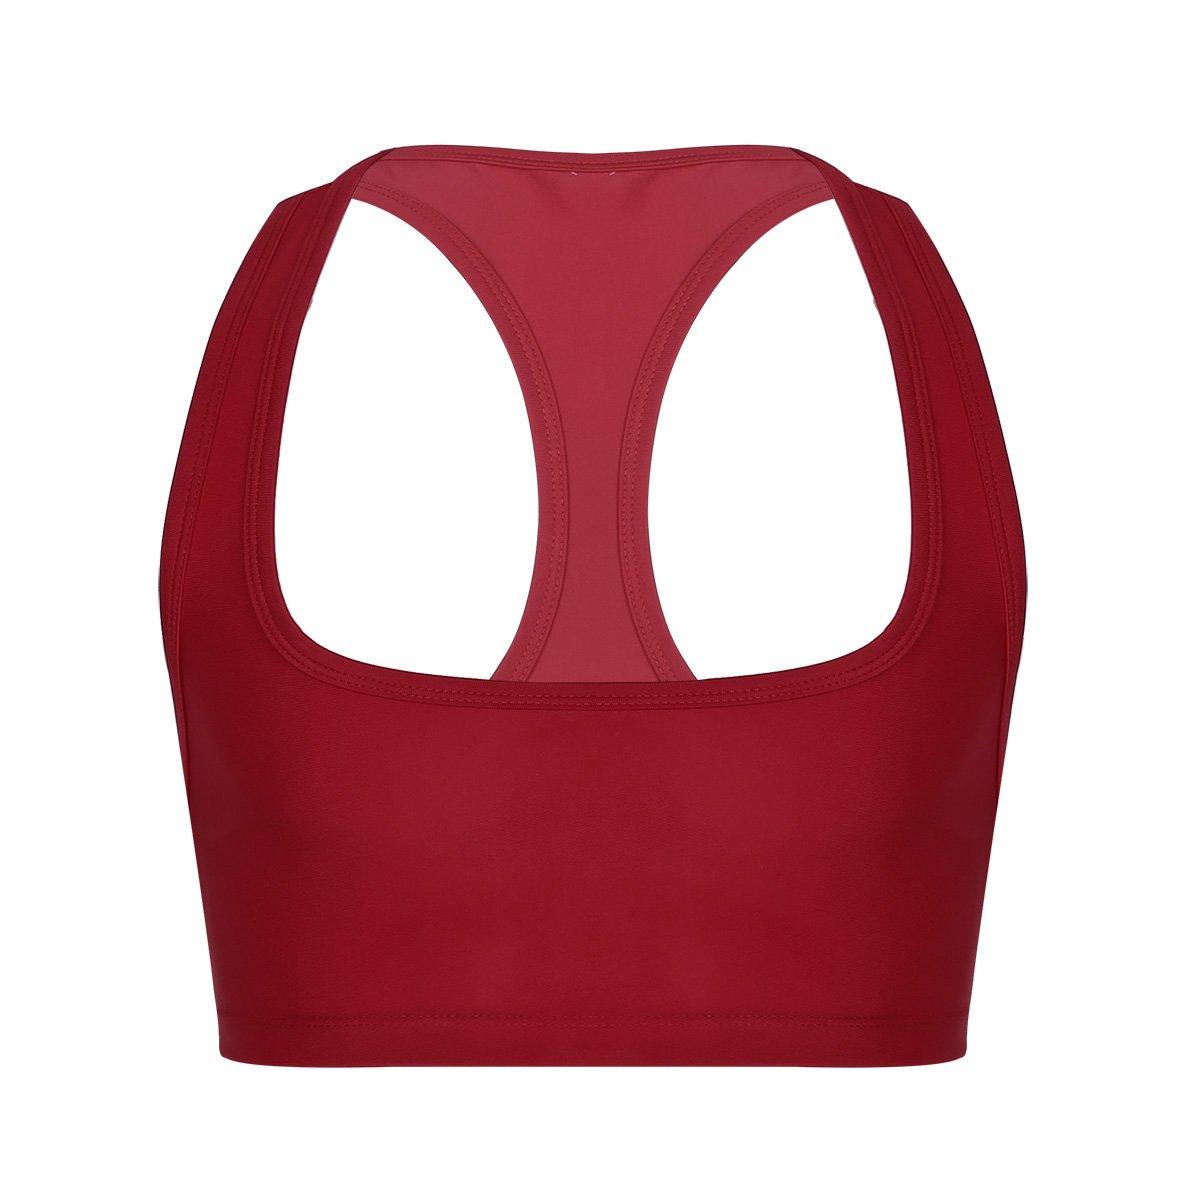 YiZYiF Men's Sleeveless Y Back Muscle Half Tank Top Vest Tee T-Shirts Crop Tops